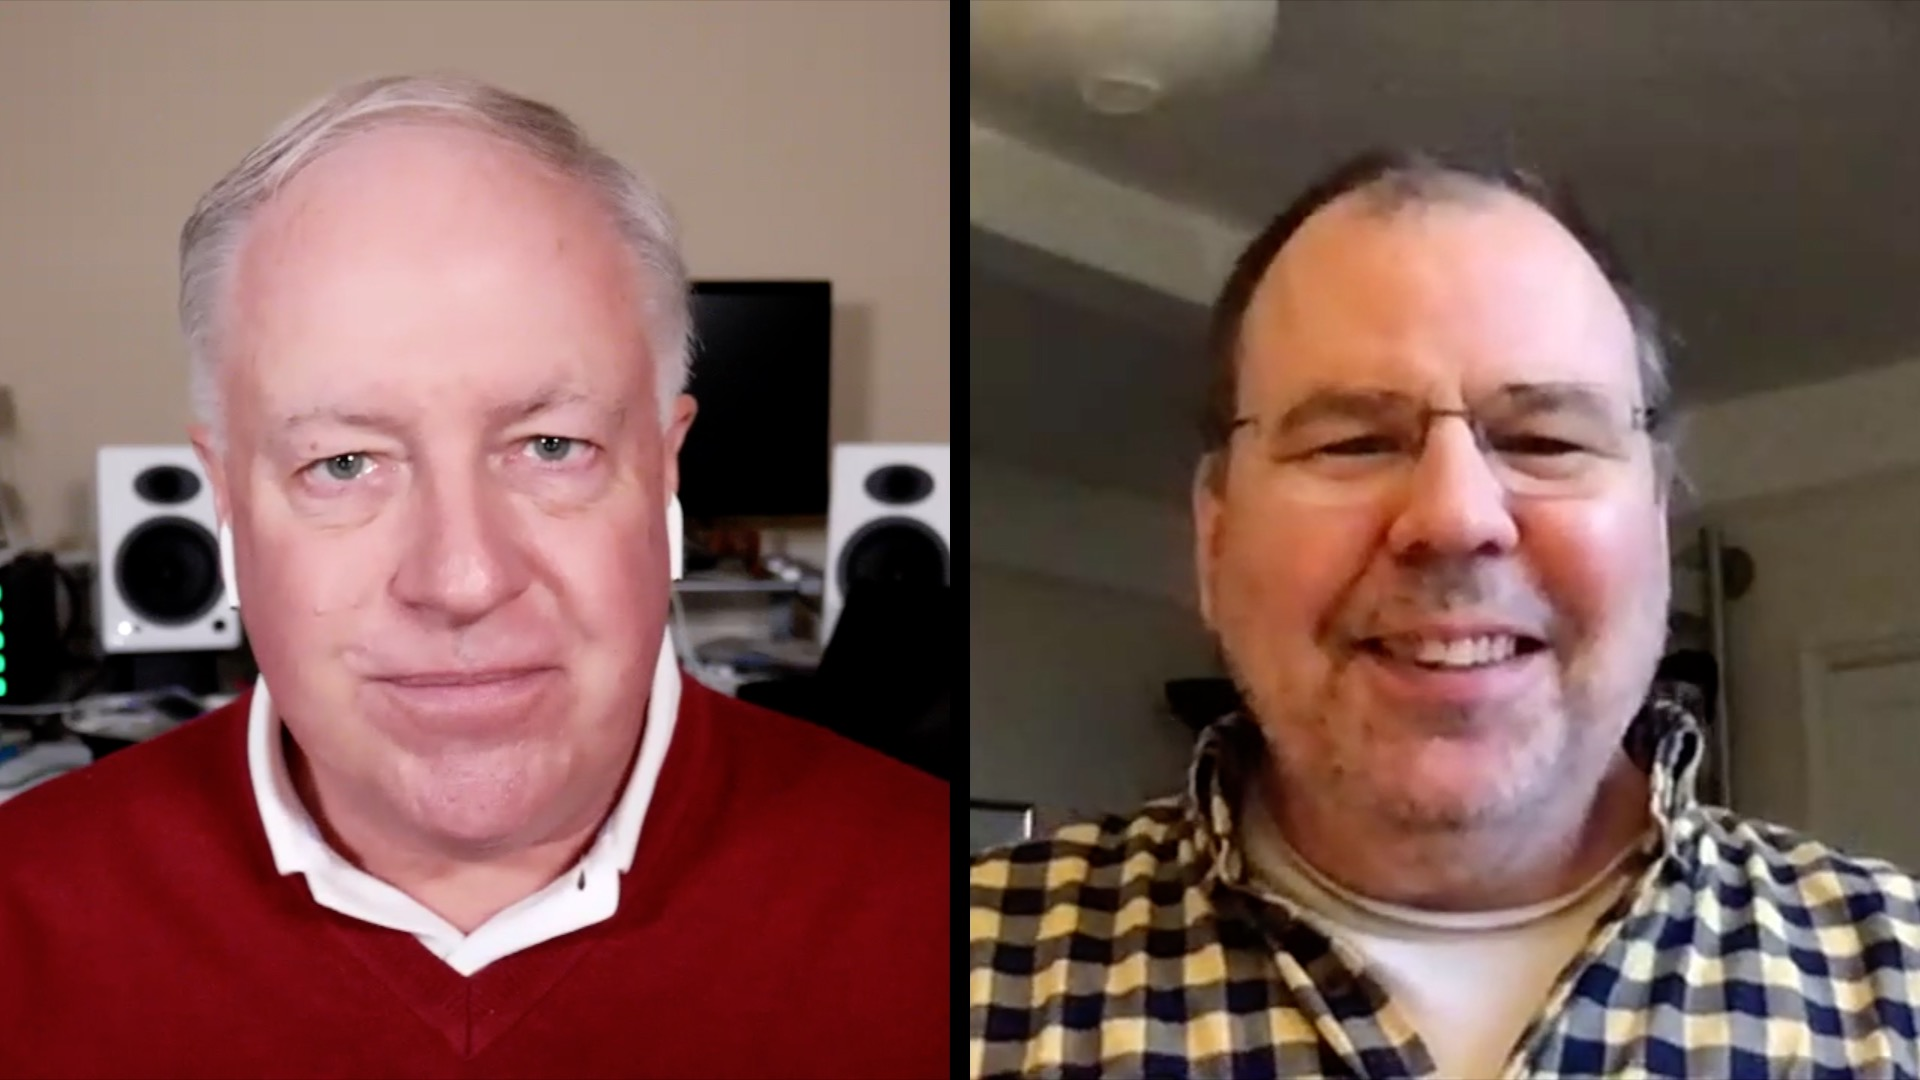 MacVoices #19230: Kirk McElhearn Takes Control of macOS Media Apps - MacVoices